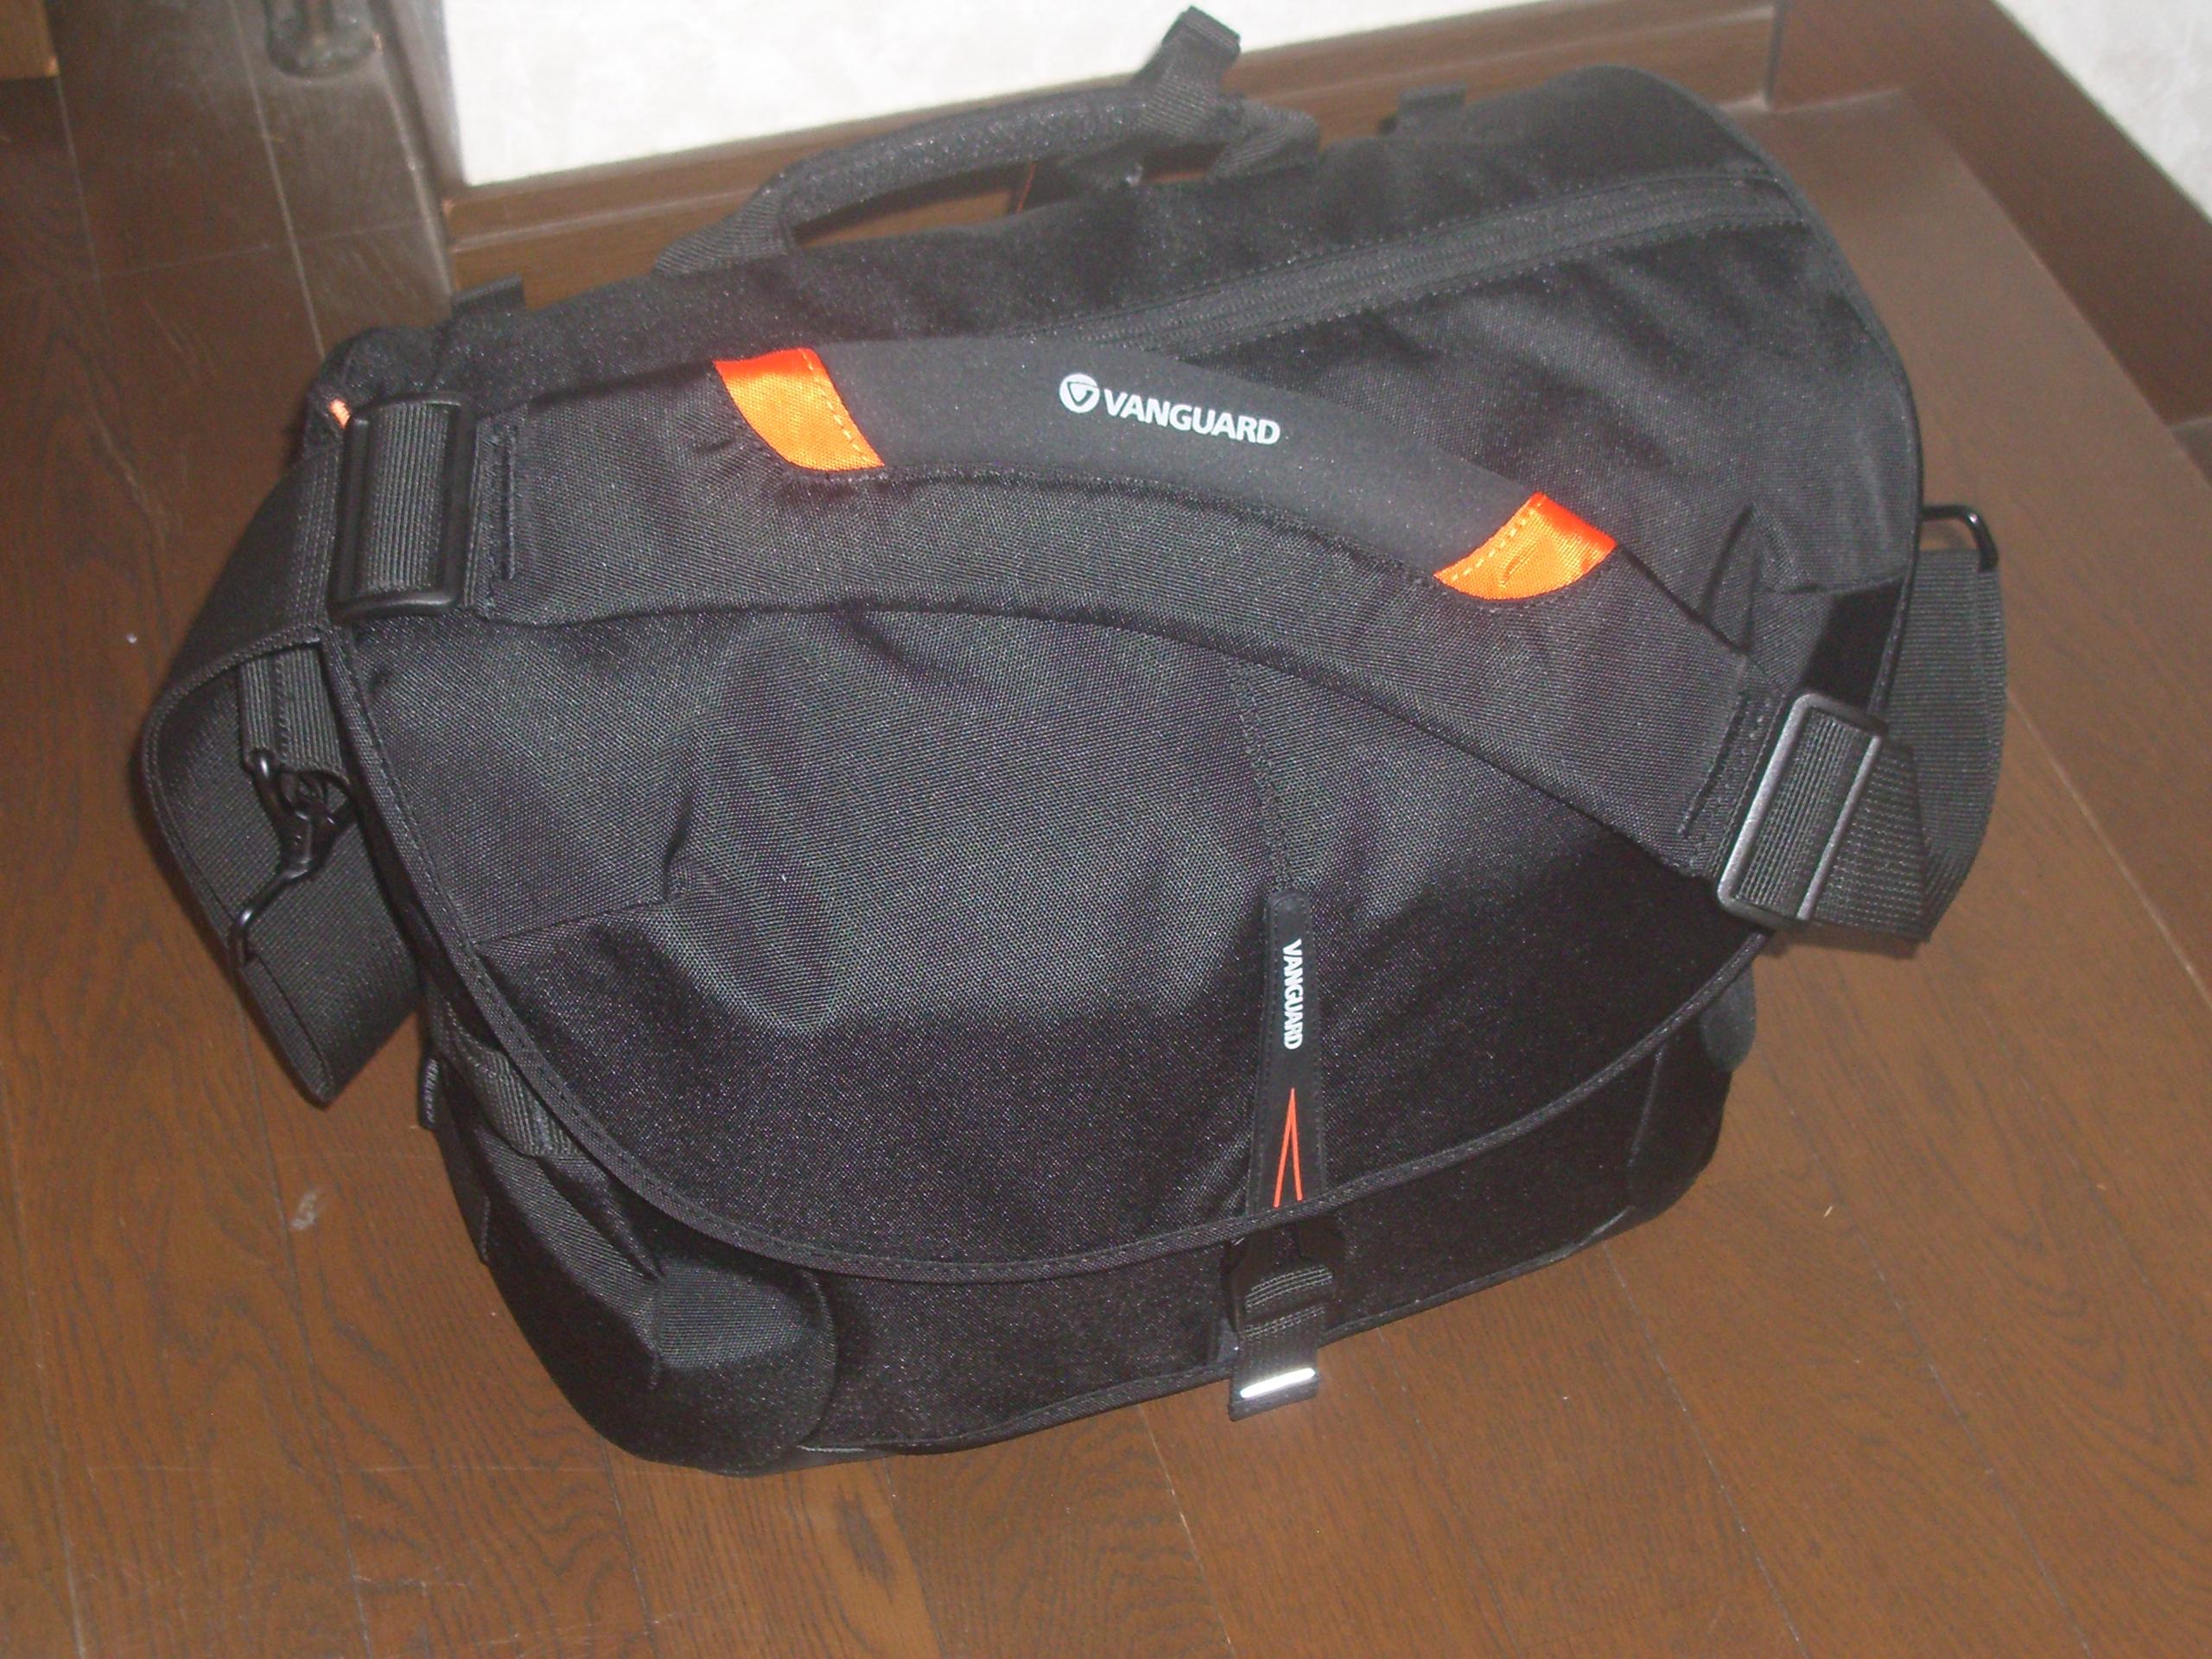 Vanguardheralder 33 Cut And Try Vanguard The Heralder Shoulder Bag